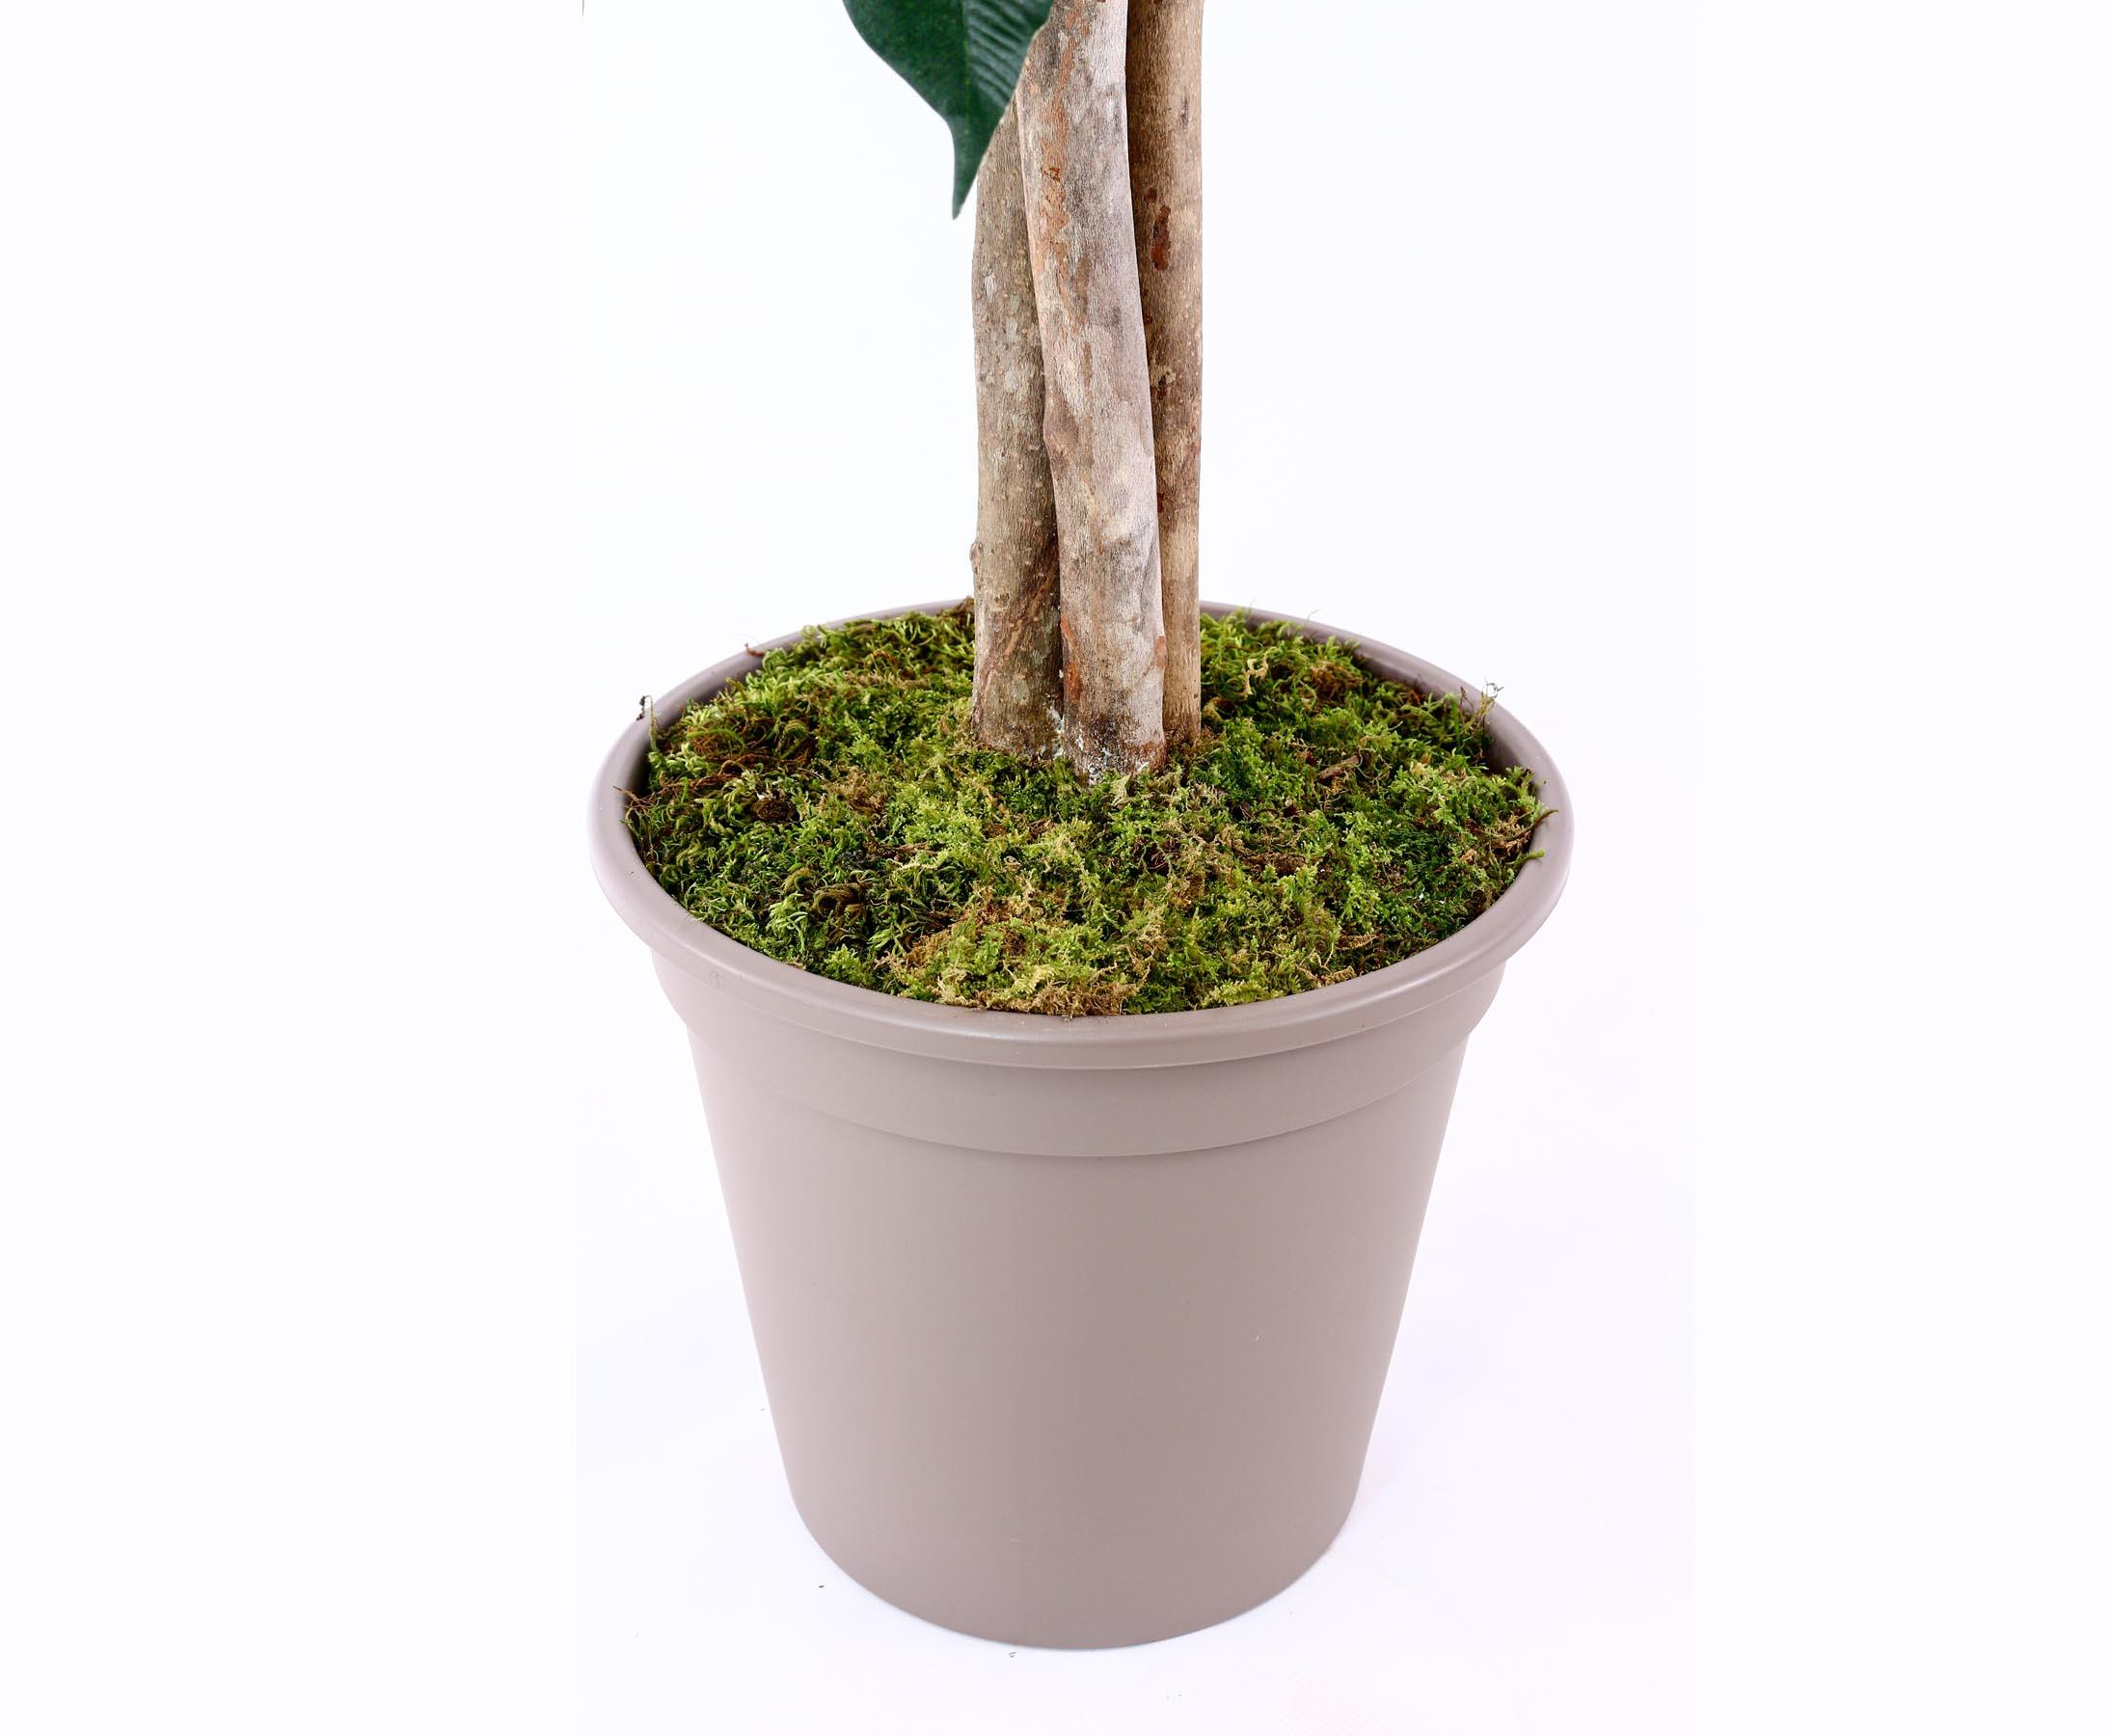 Kunstpflanze Kunstbaum Zitronenbaum 120 cm Dekobaum